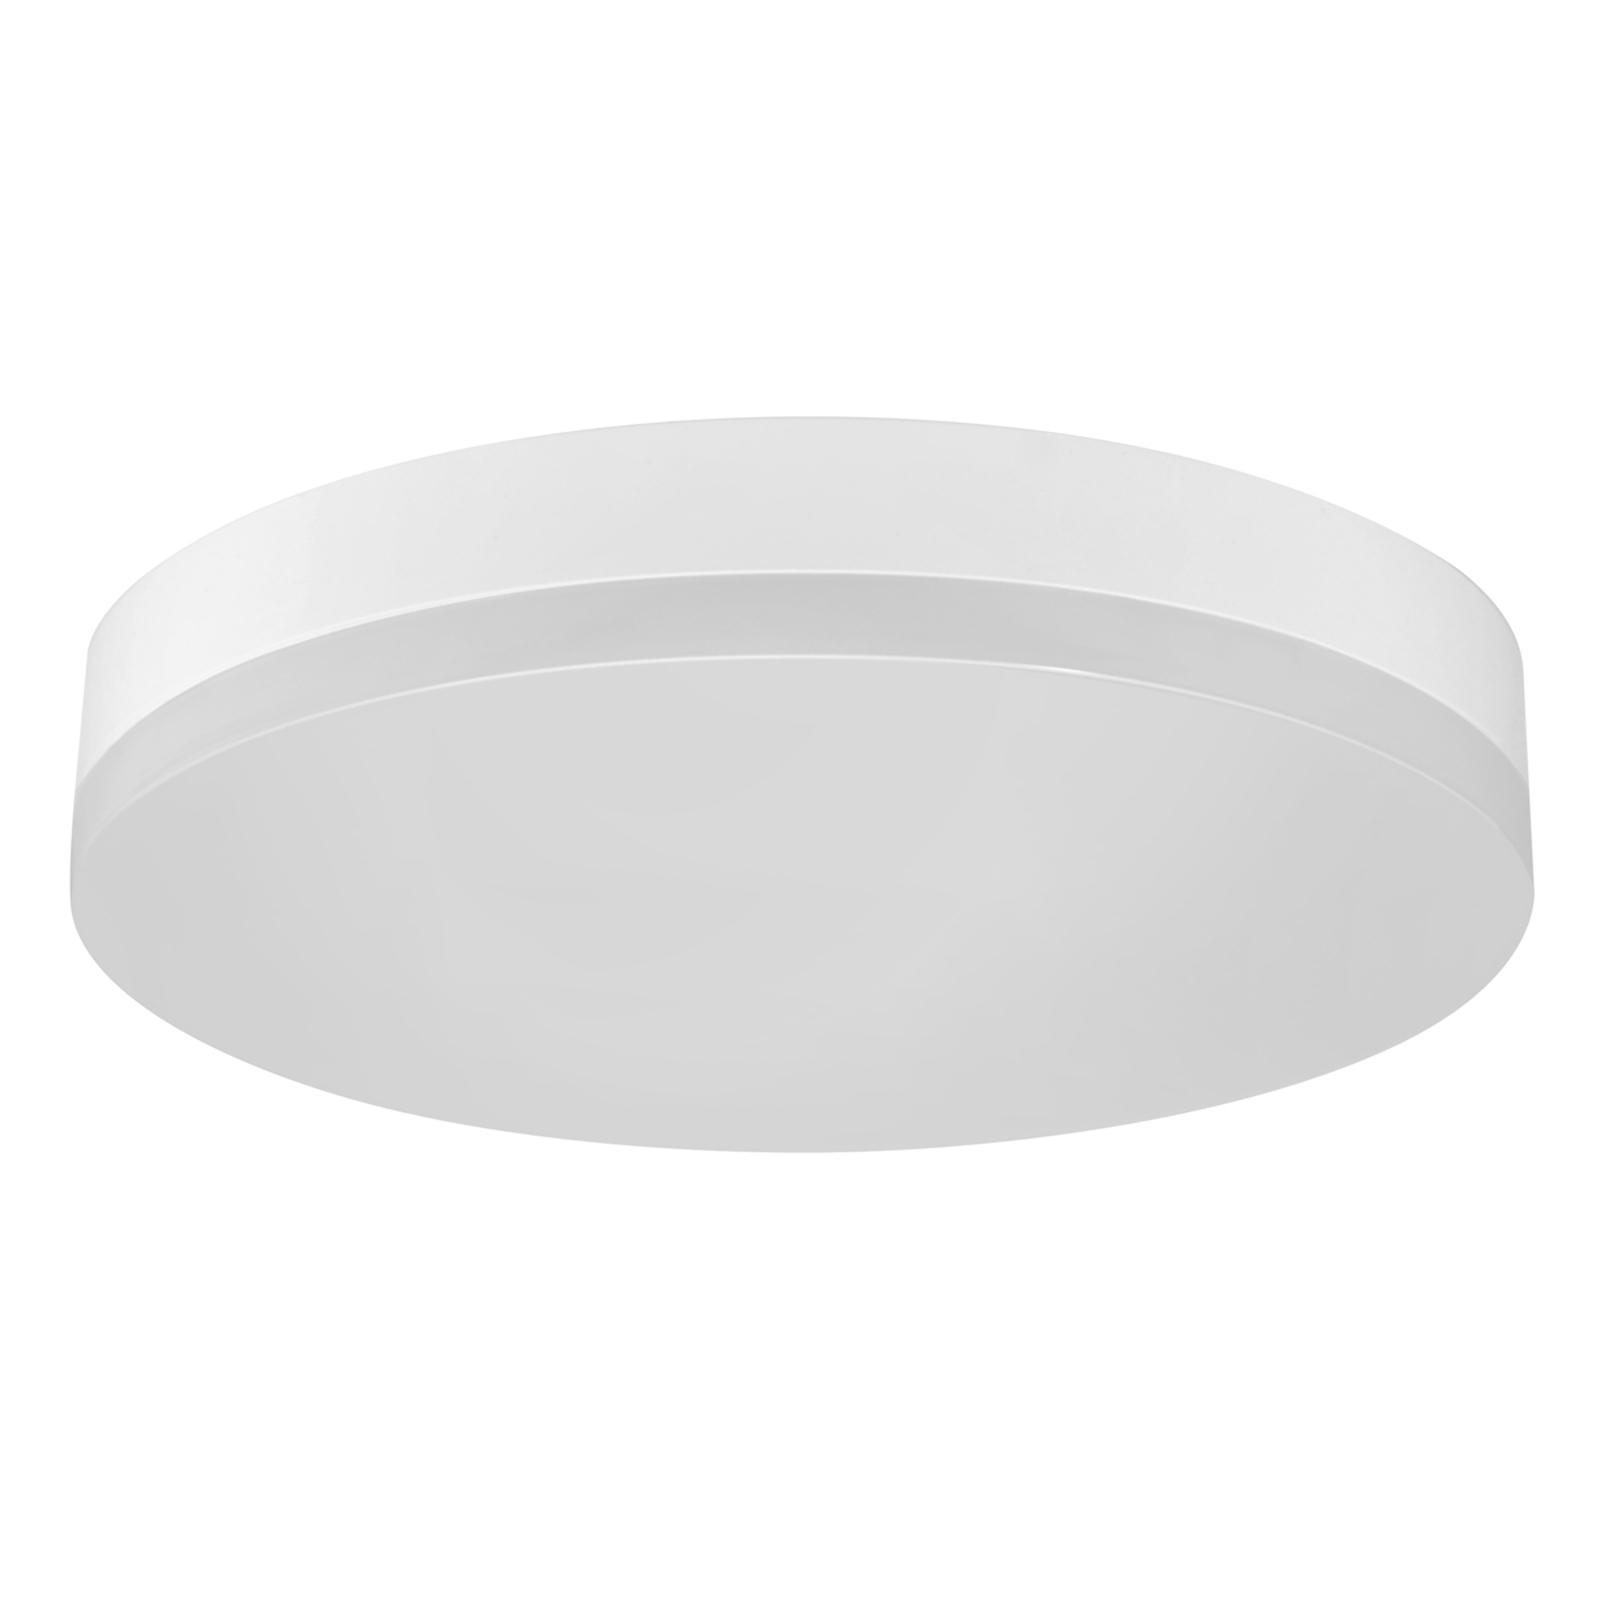 Office Round - LED-taklampe IP44, varmhvit